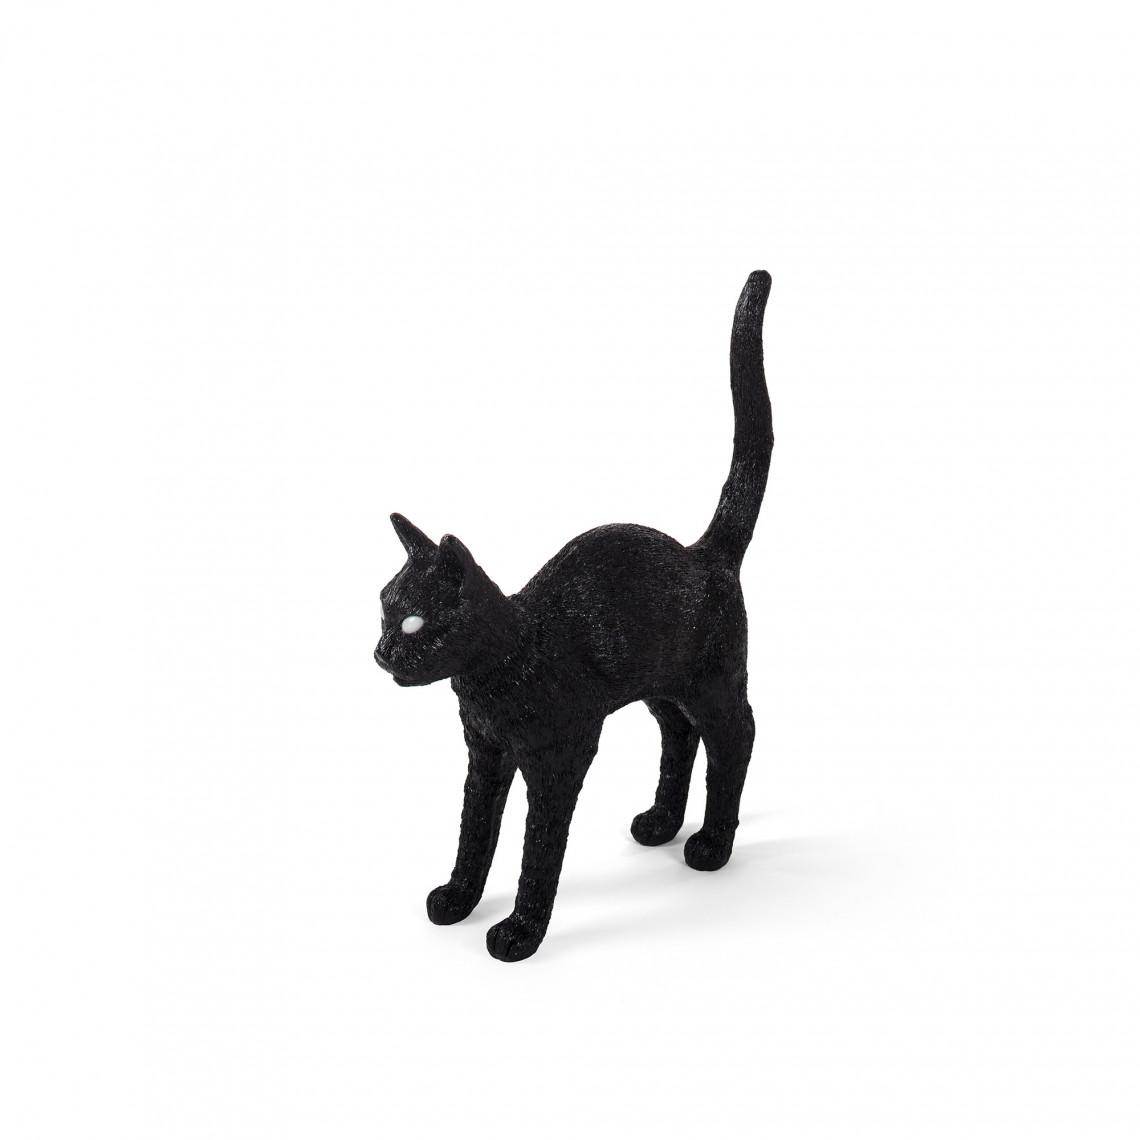 Jobby The Cat - Svart